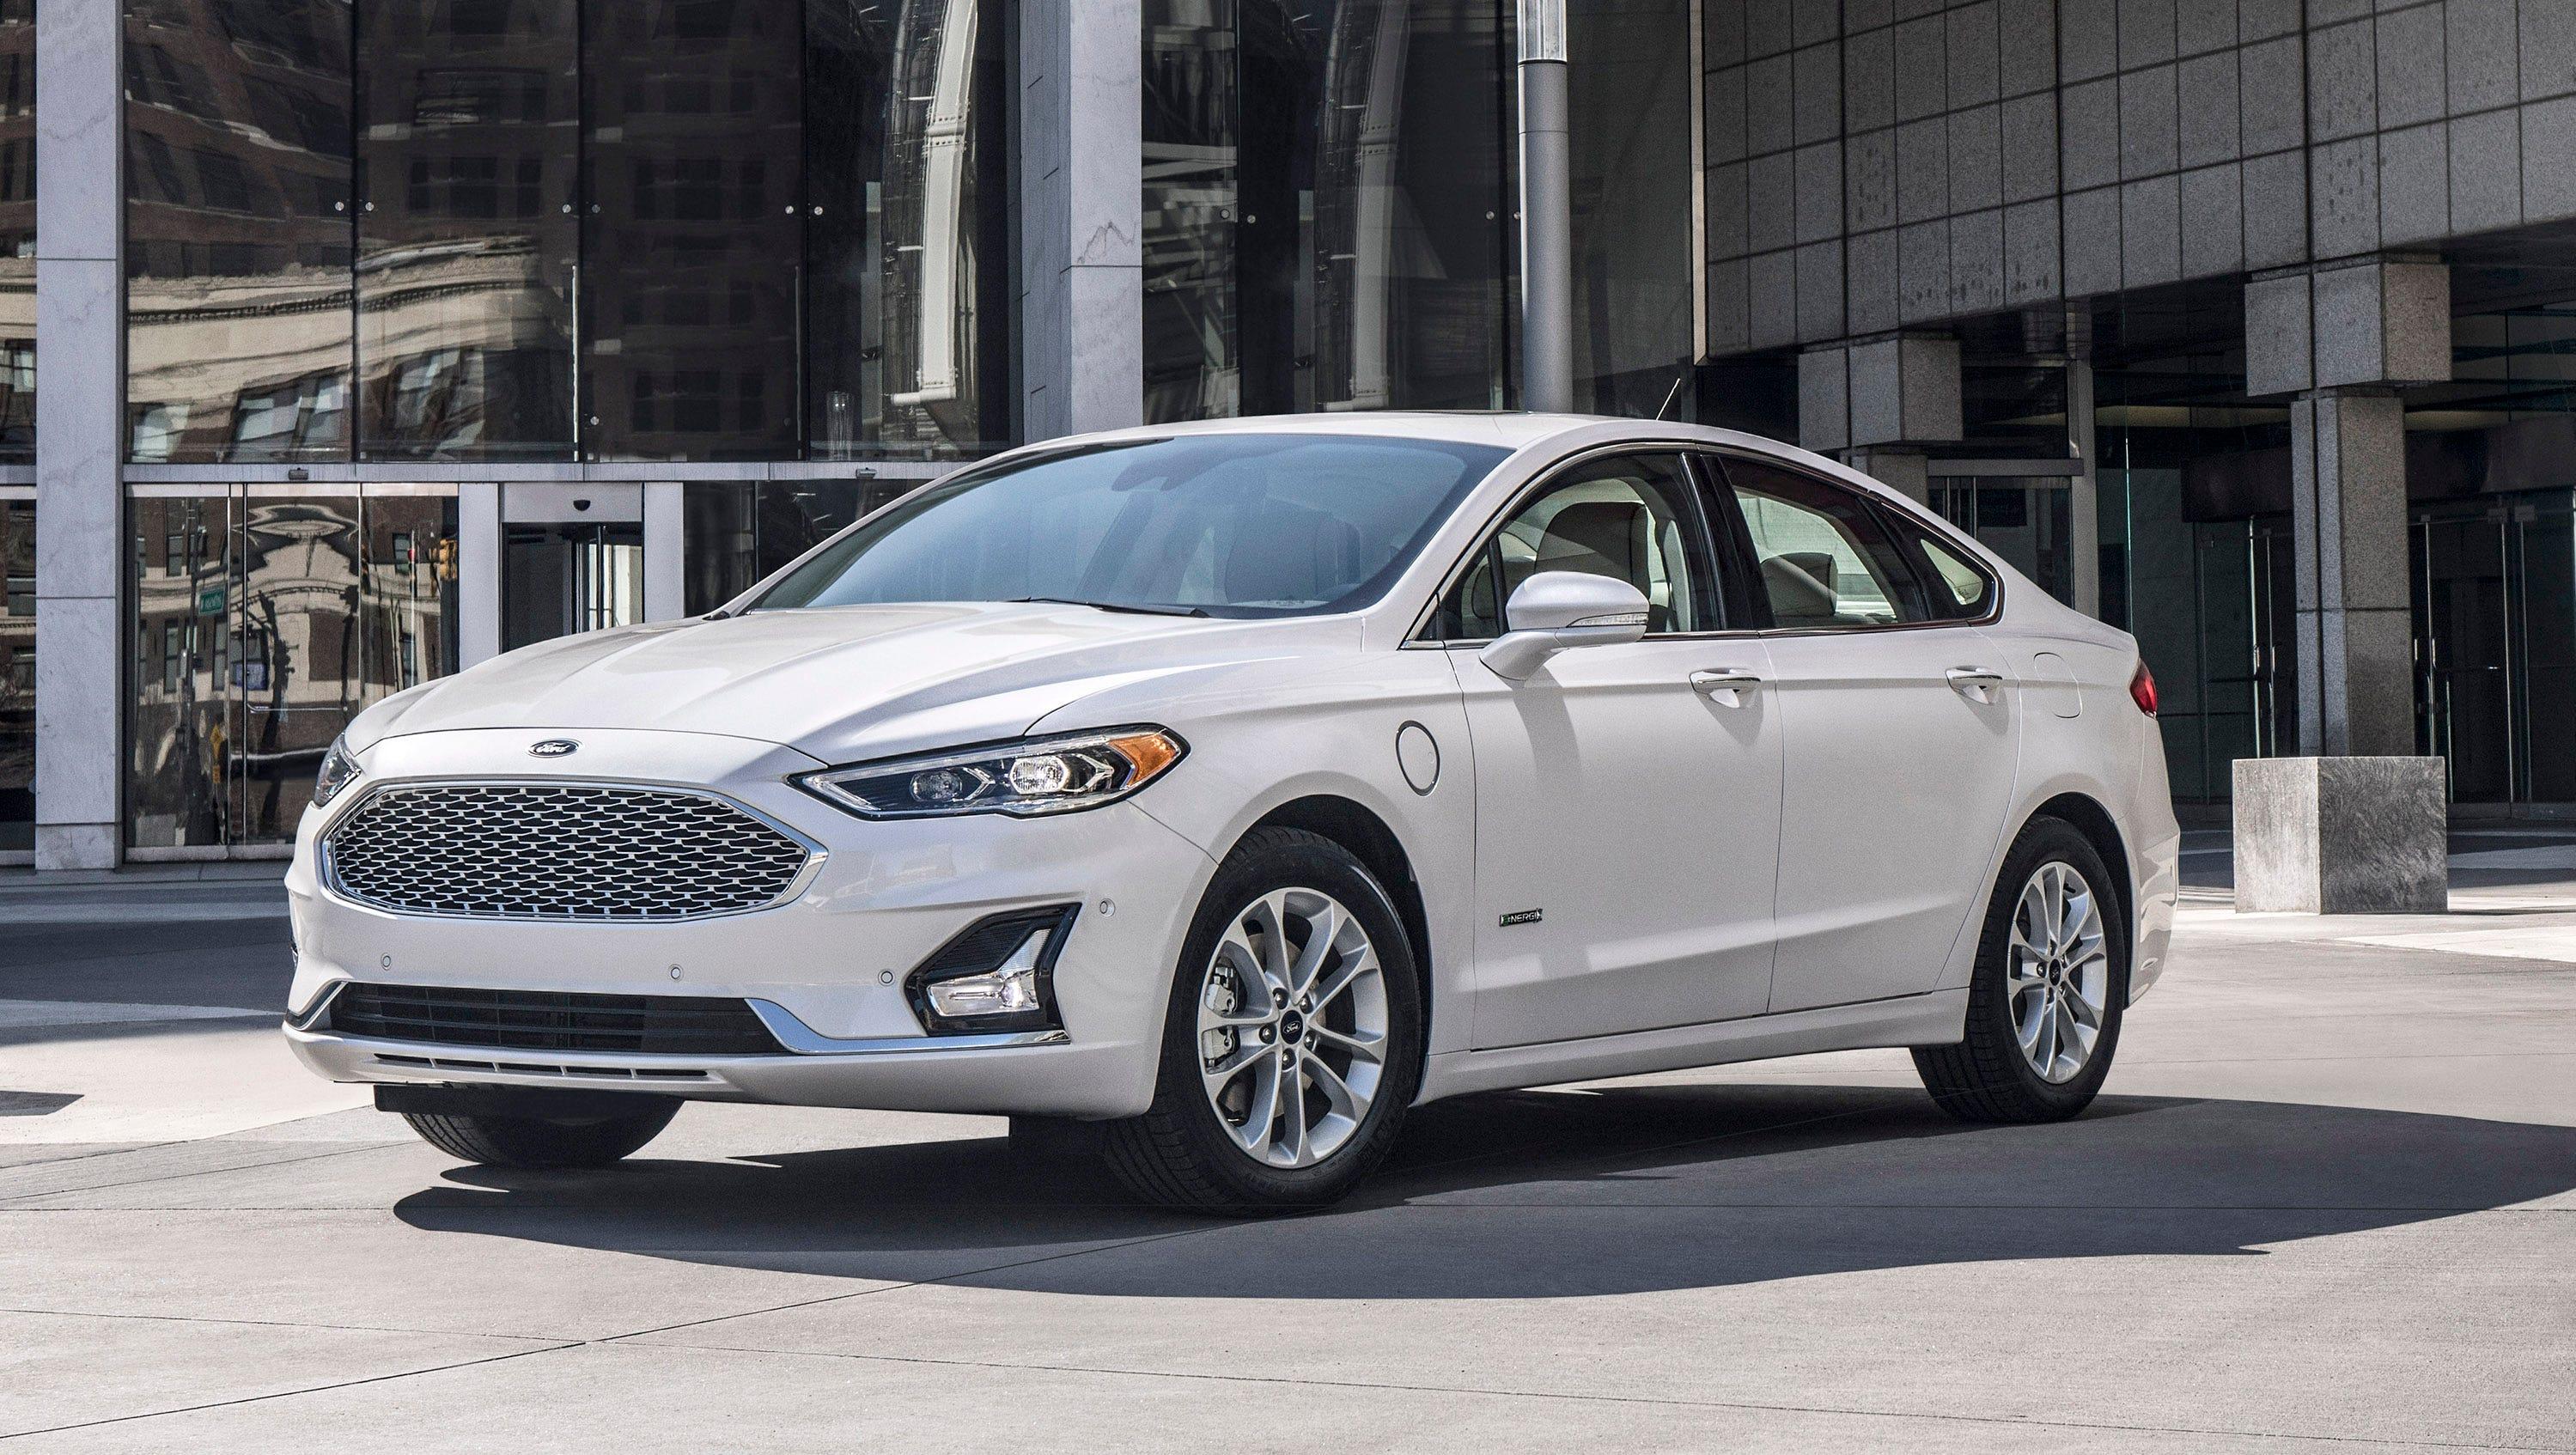 Ford plans to make fusion longer taller more brawny